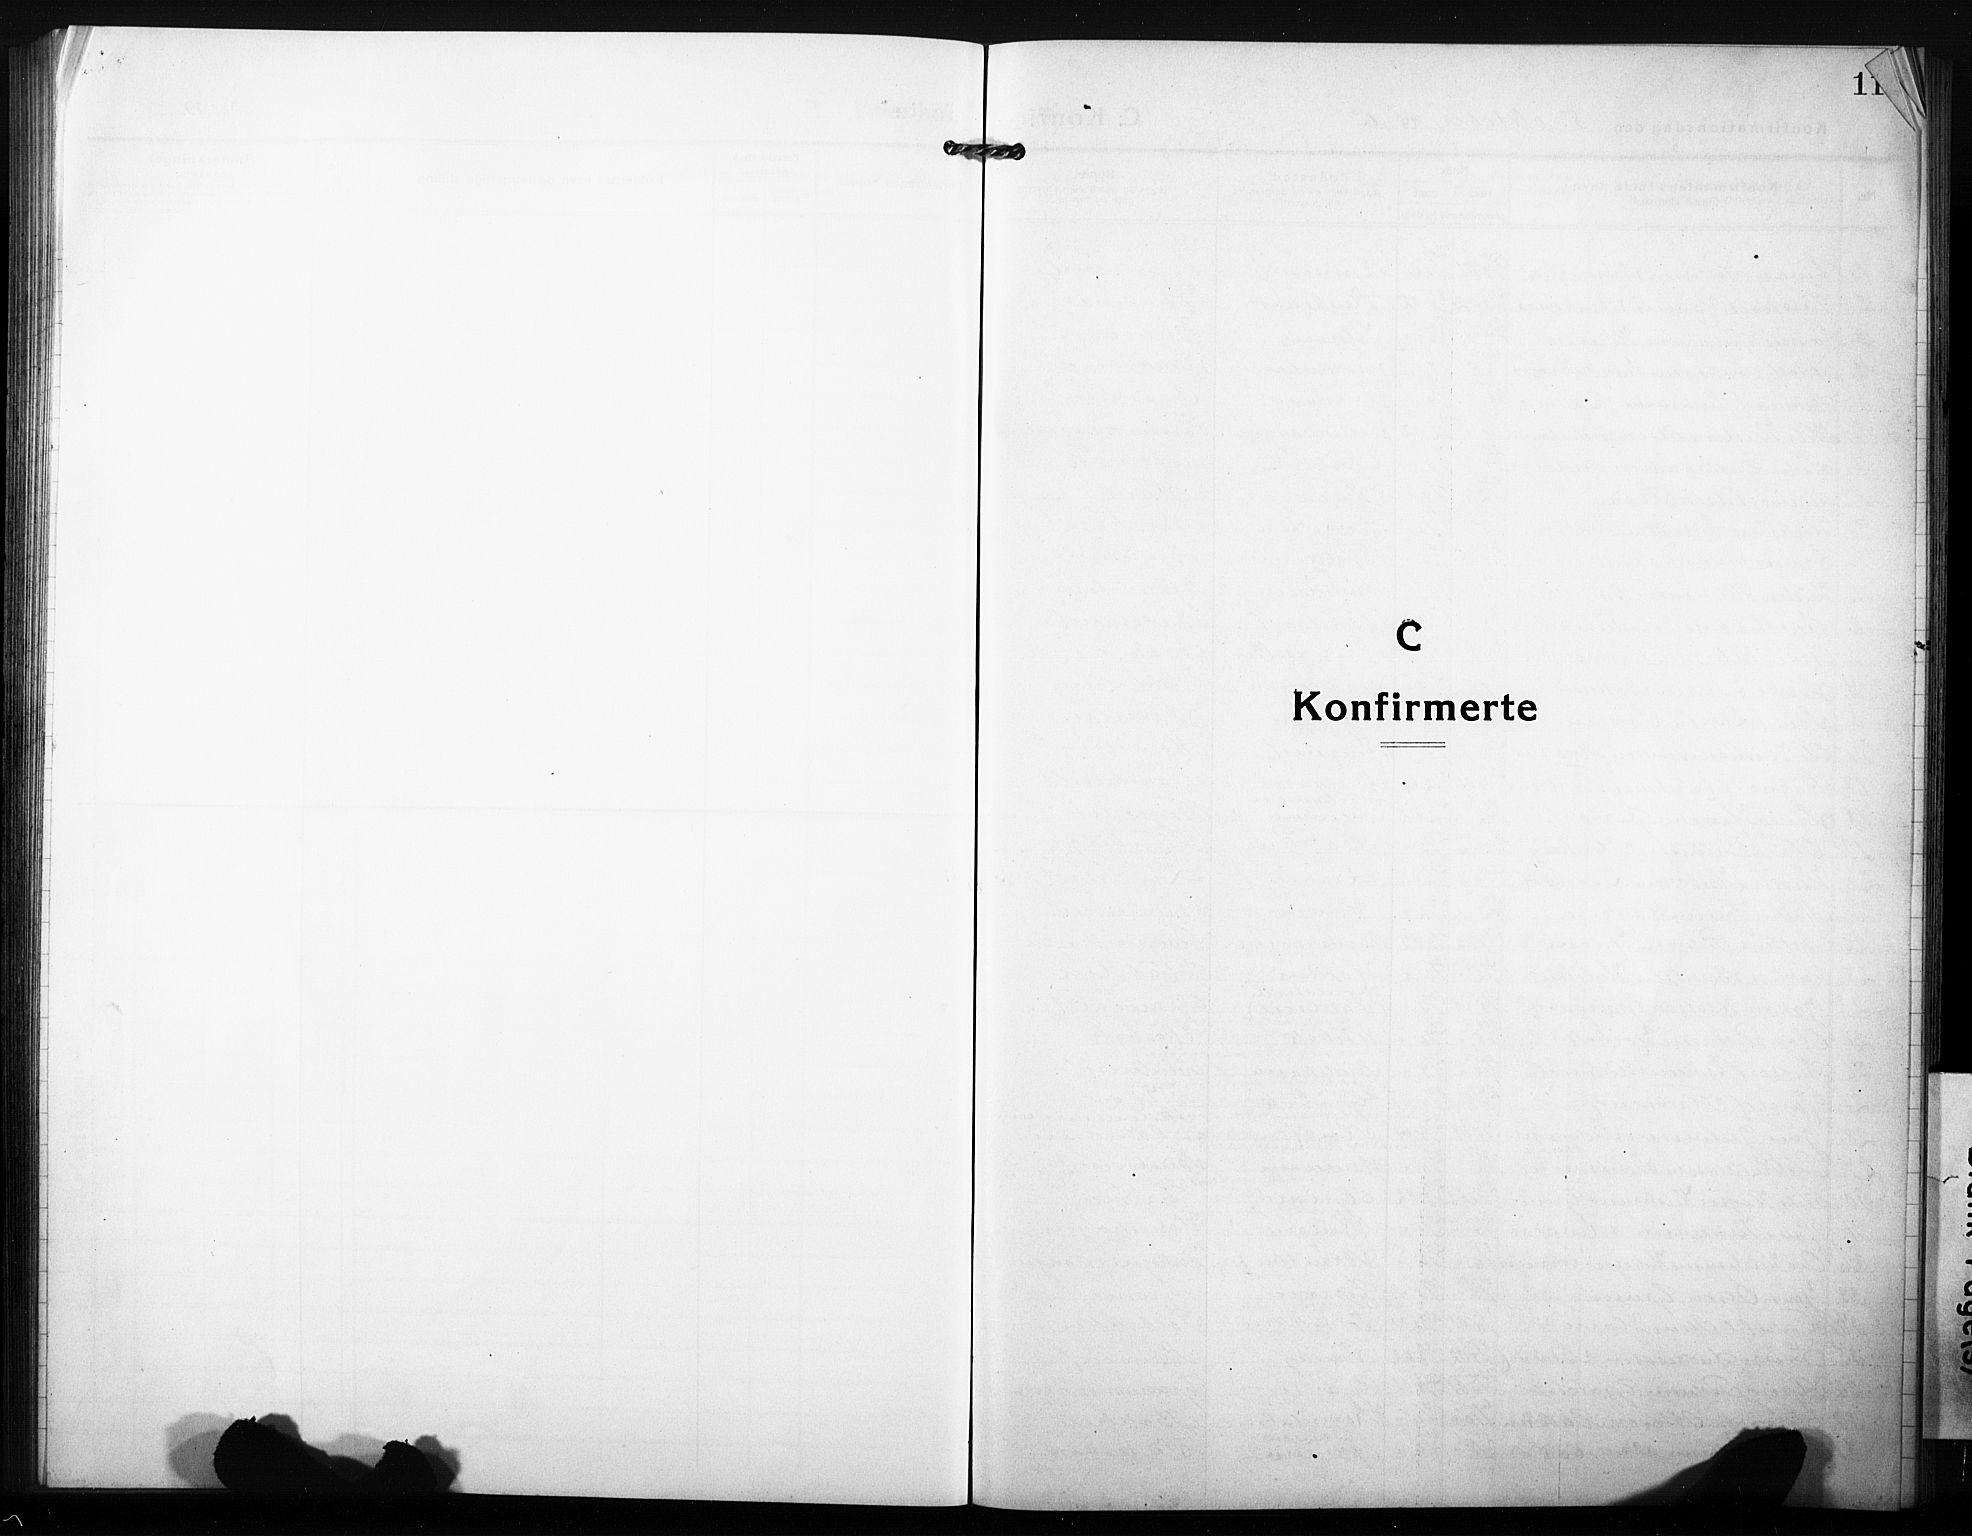 SAH, Søndre Land prestekontor, L/L0007: Klokkerbok nr. 7, 1915-1932, s. 112